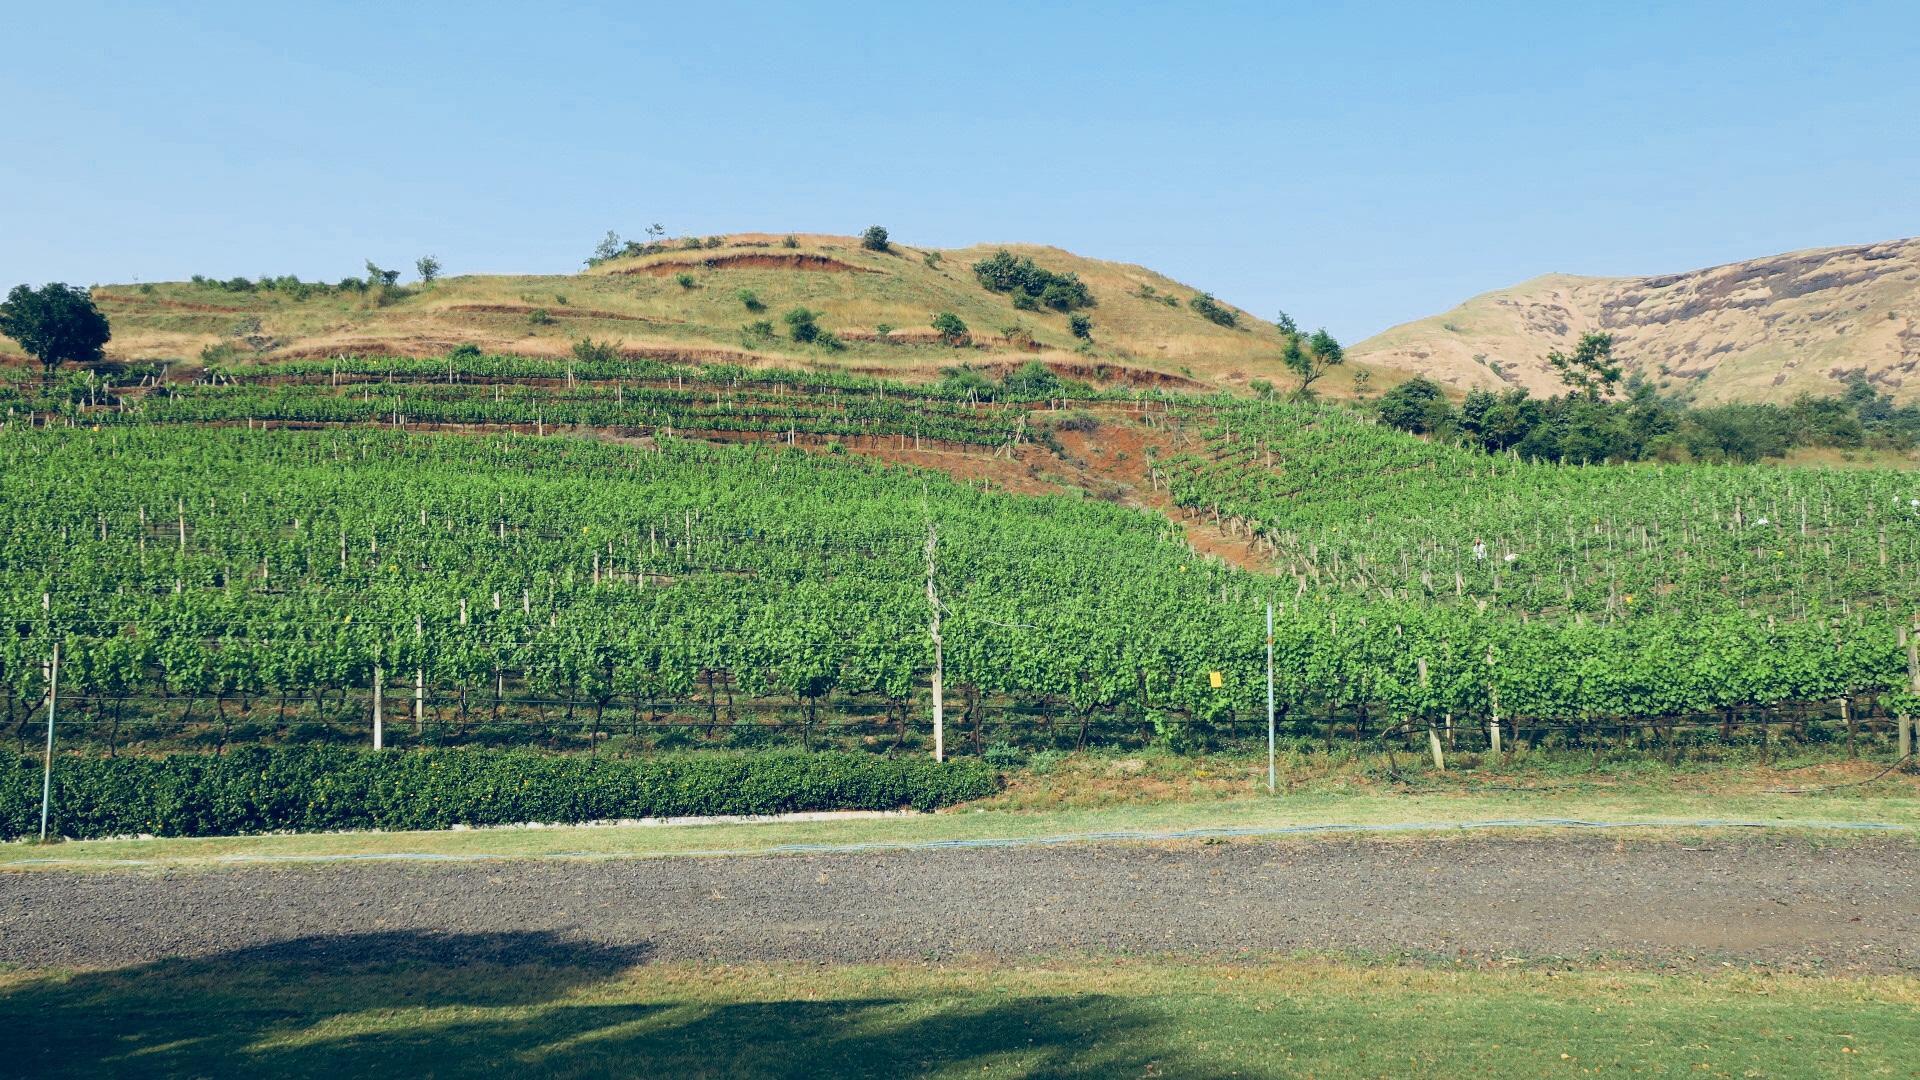 One Tree Hill vineyard at Igatpuri, Maharashtra (Photo credit: Sumita Sarma, Sumilier)